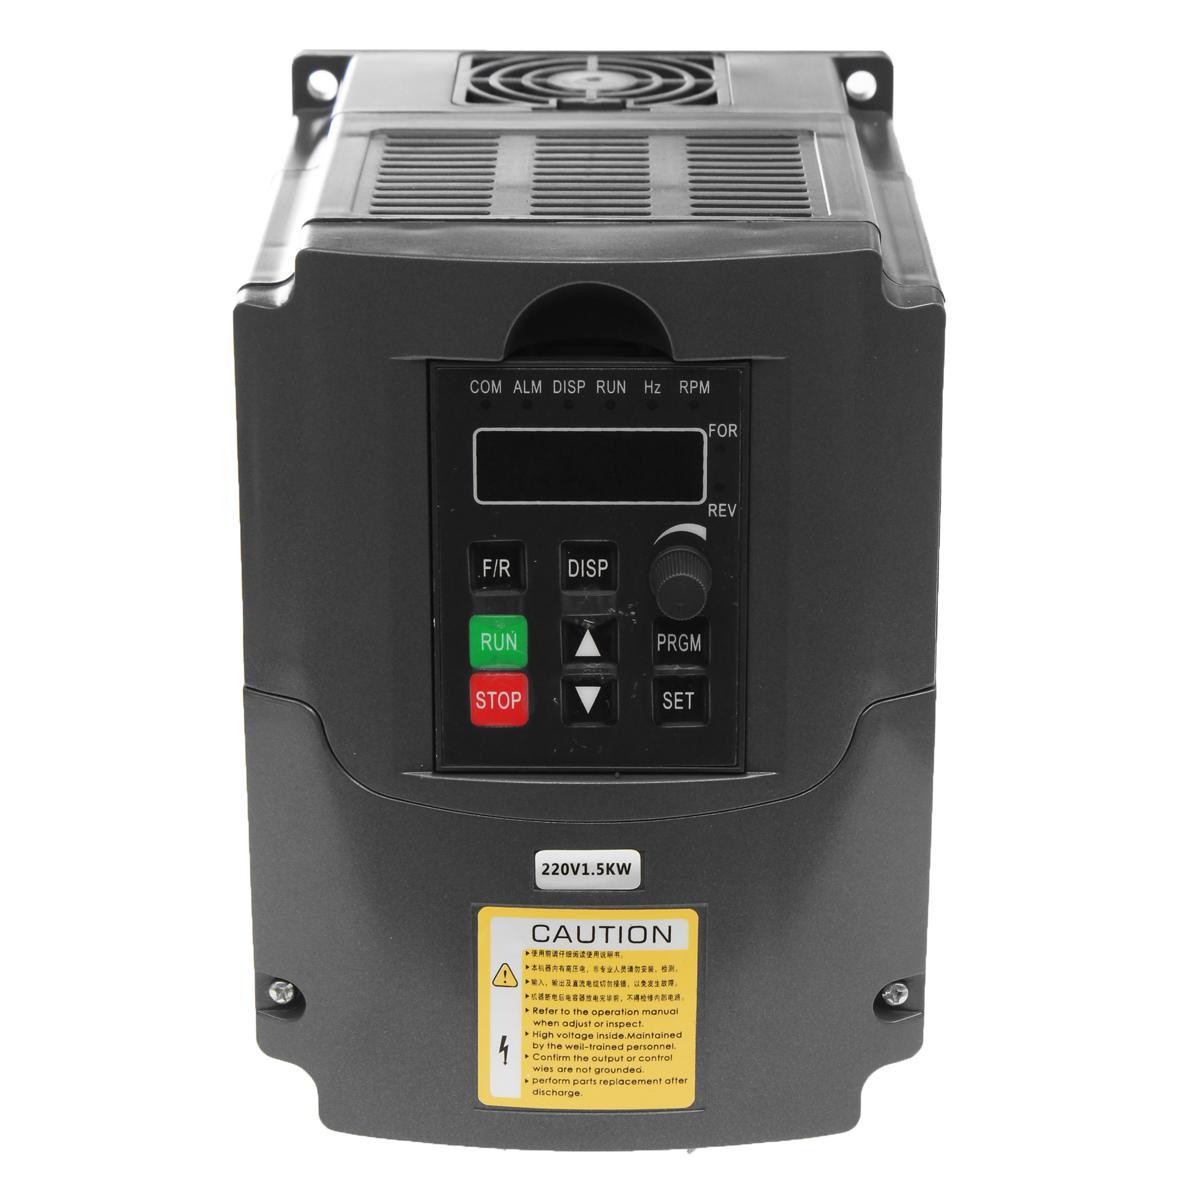 Cek Harga Baru 220v 1500w 1 5kw Inverter Converter Auto Voltage Fresmul 15kw Regulation Technique Vector Control 2